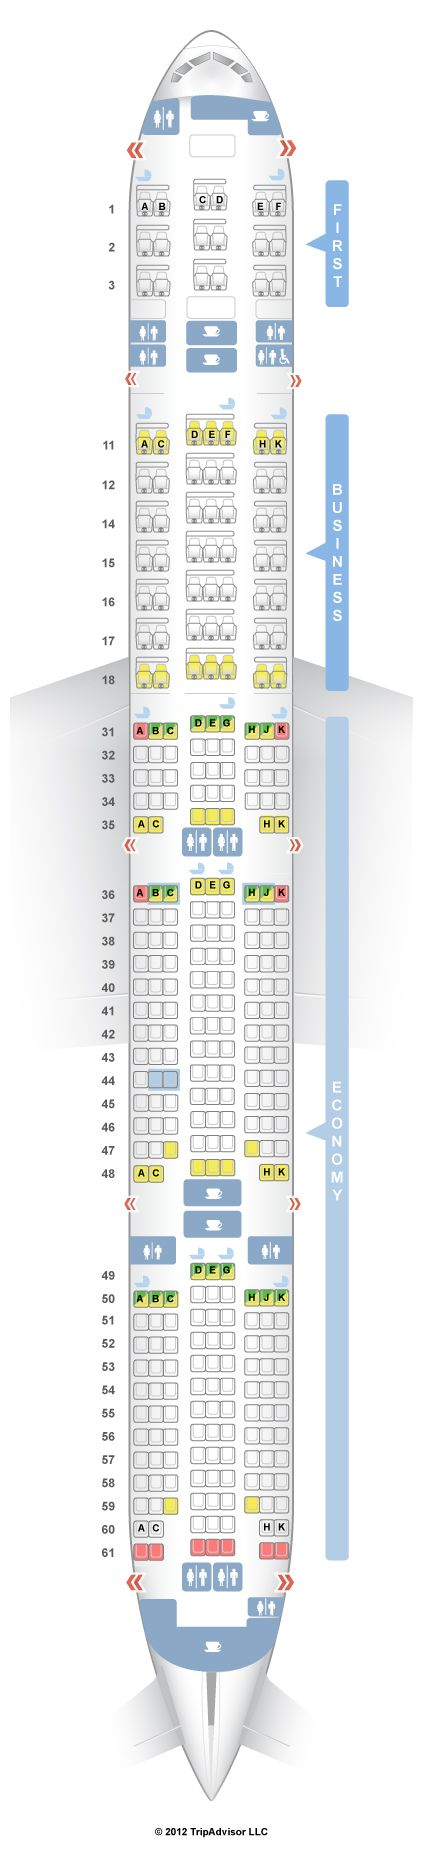 SeatGuru Seat Map Singapore Airlines Boeing 777-300 (773) V1